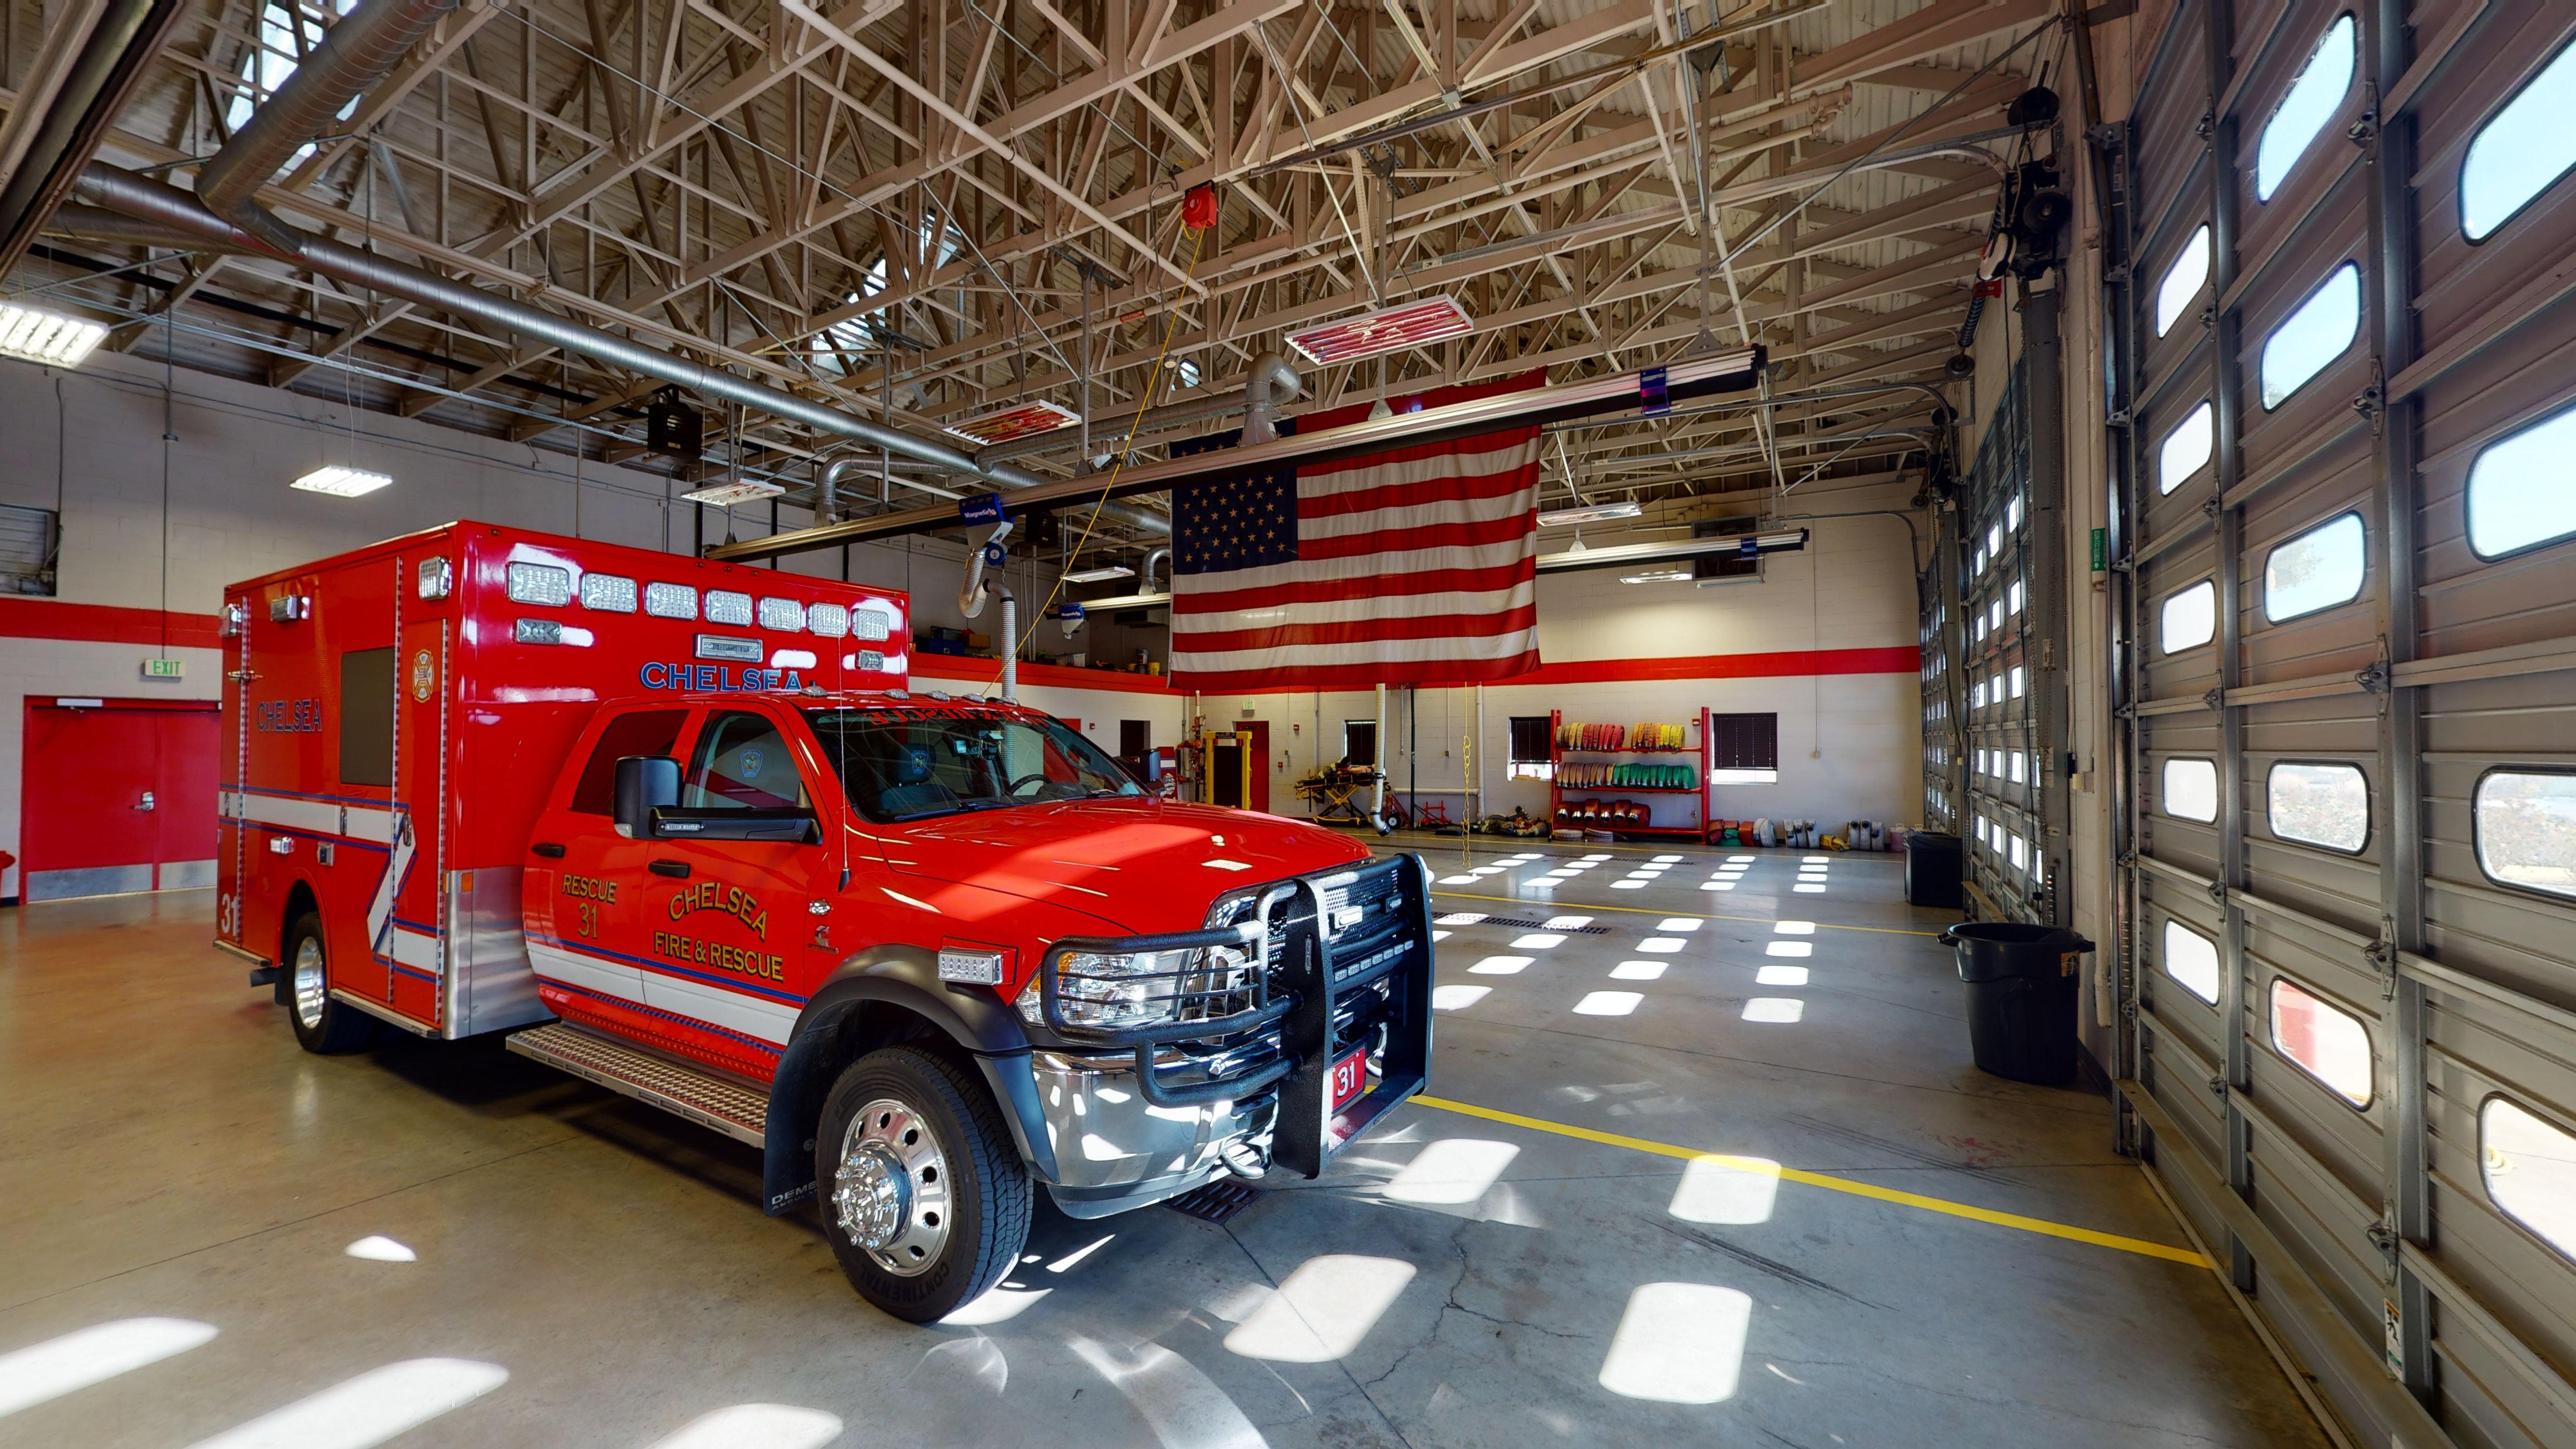 6_Chelsea-Fire-Rescue-Demers-151-06162021_101039